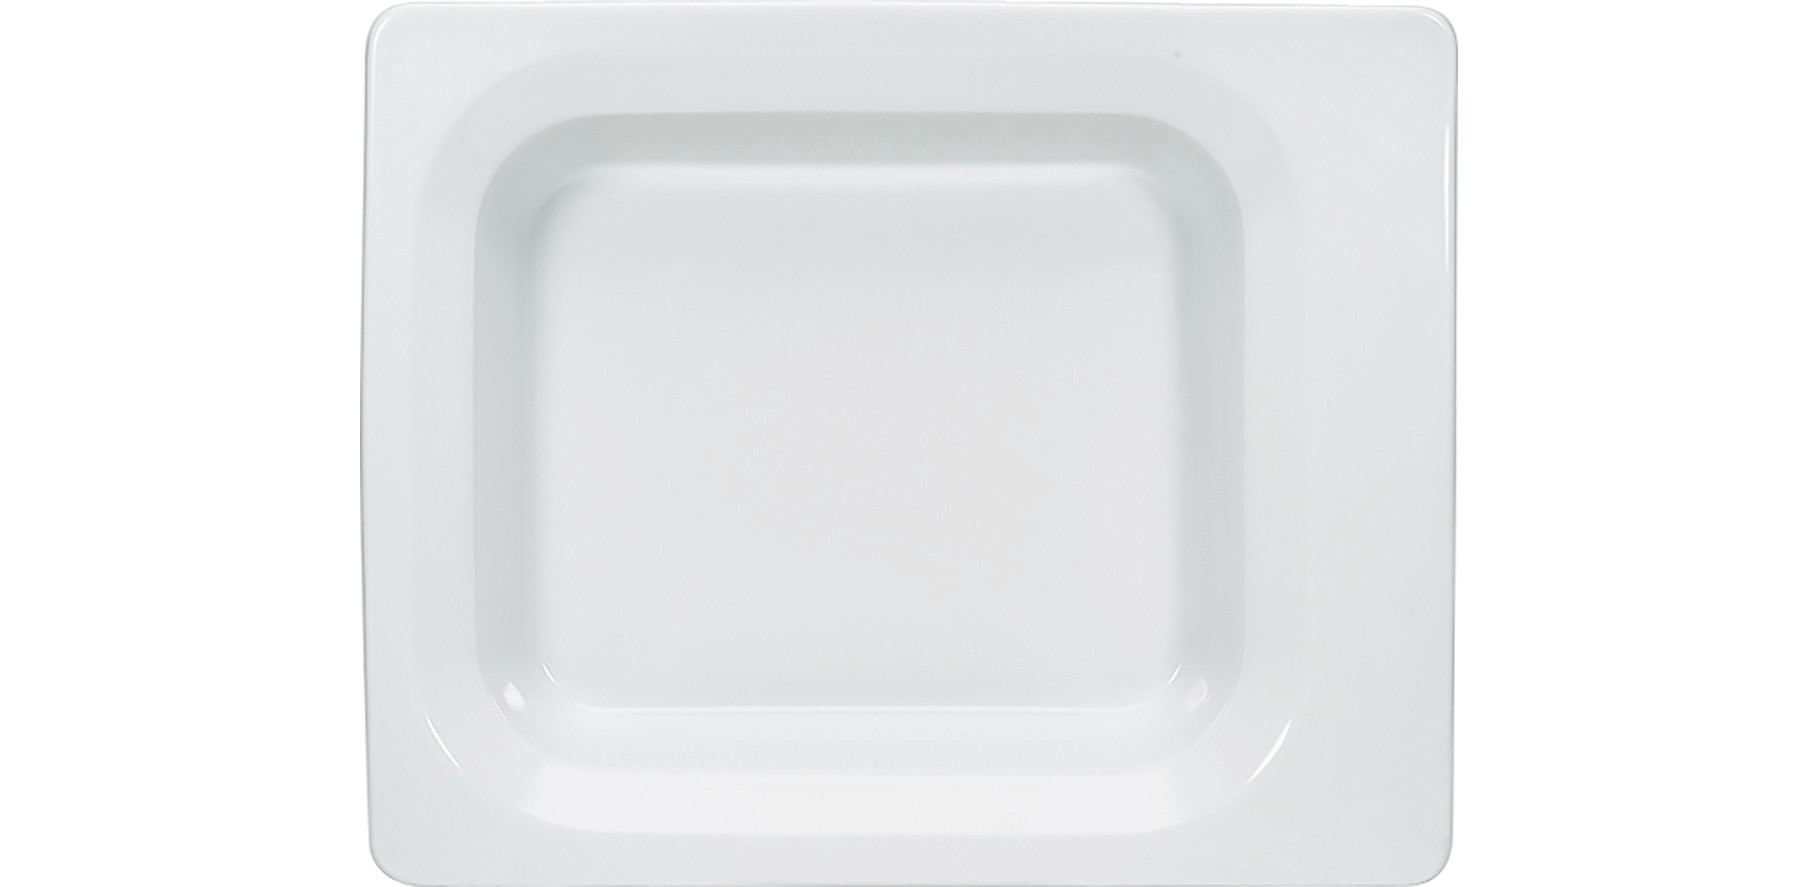 Scenario GN, GN-Schale GN 1/2 325 x 265 x 22 mm